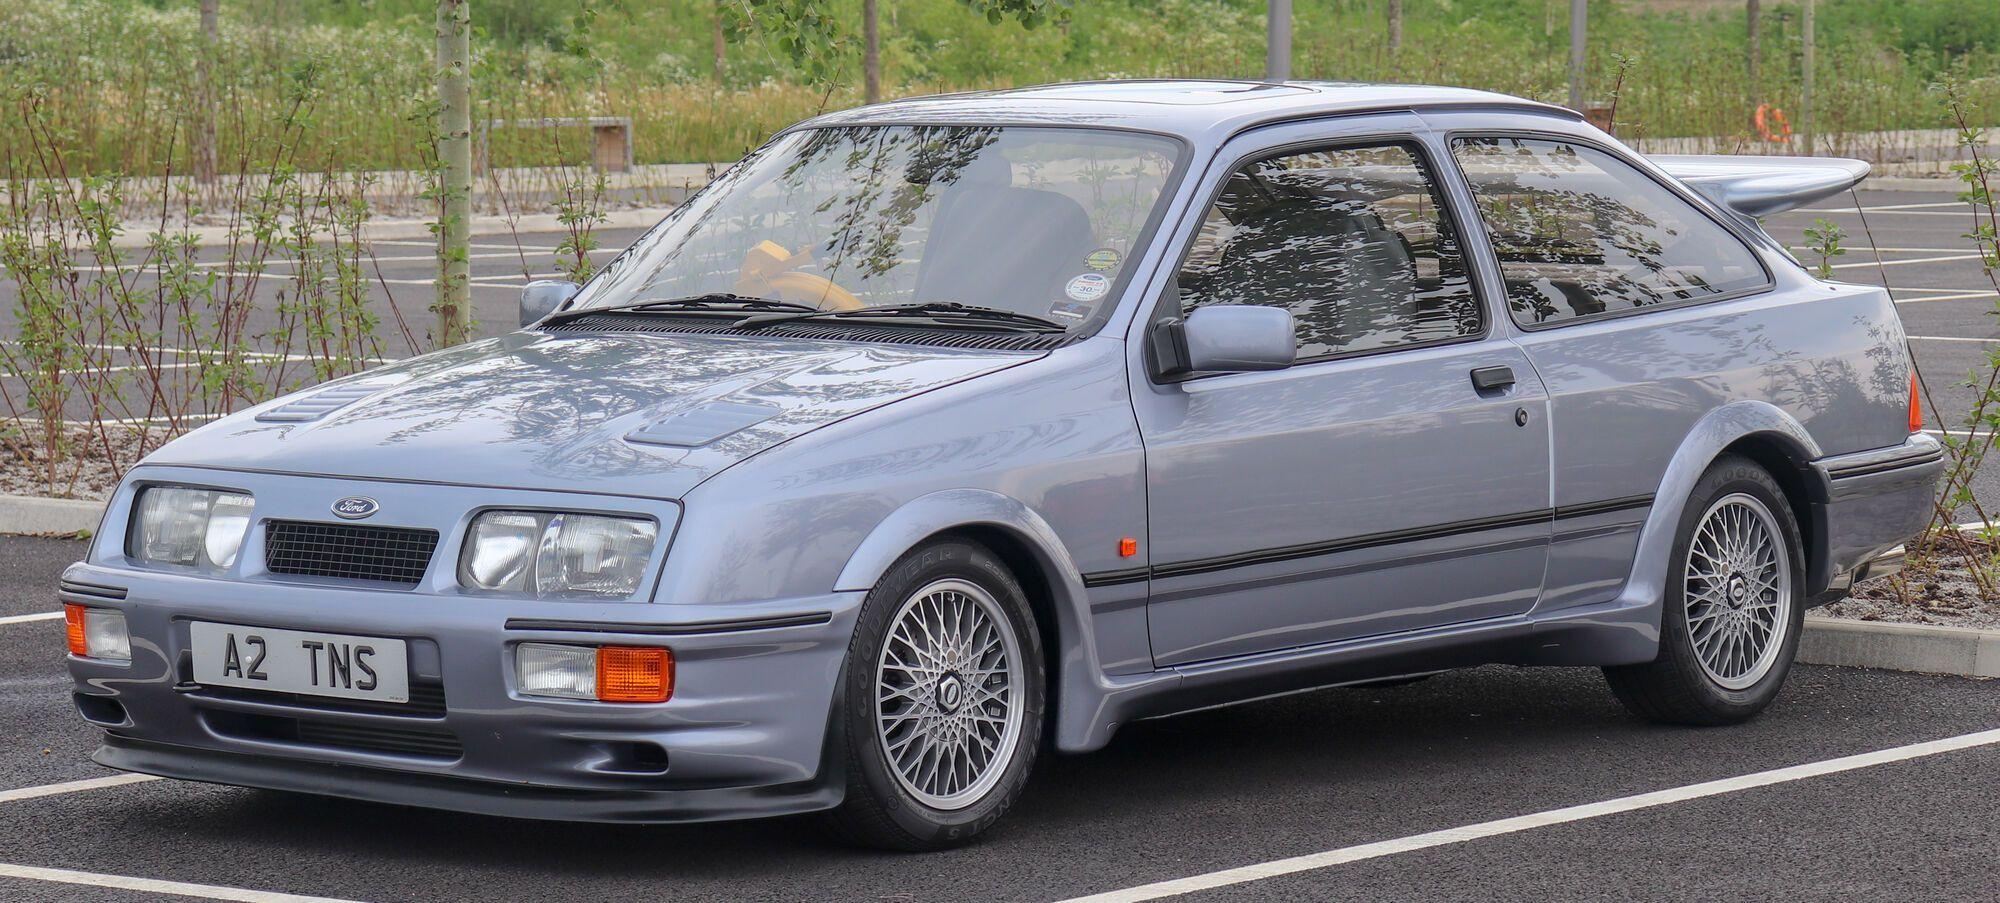 В Европе очень любят авто 80-х, такие как Ford Sierra Cosworth